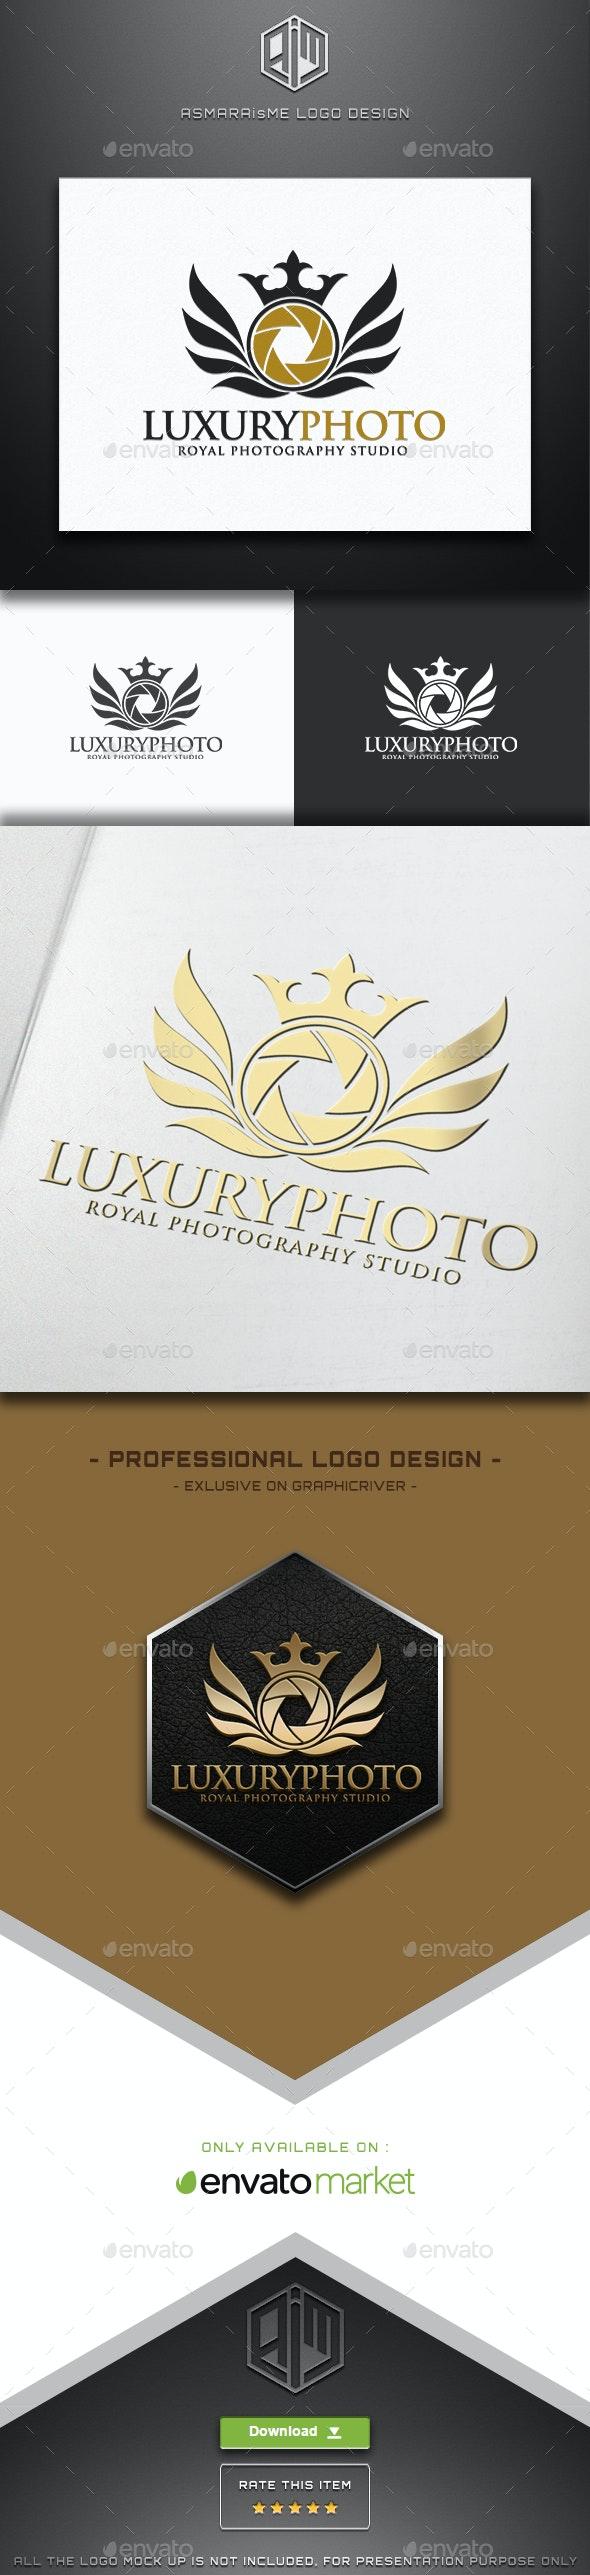 Camera Logo - Luxury Photo - Royal Photography Studio - Crests Logo Templates